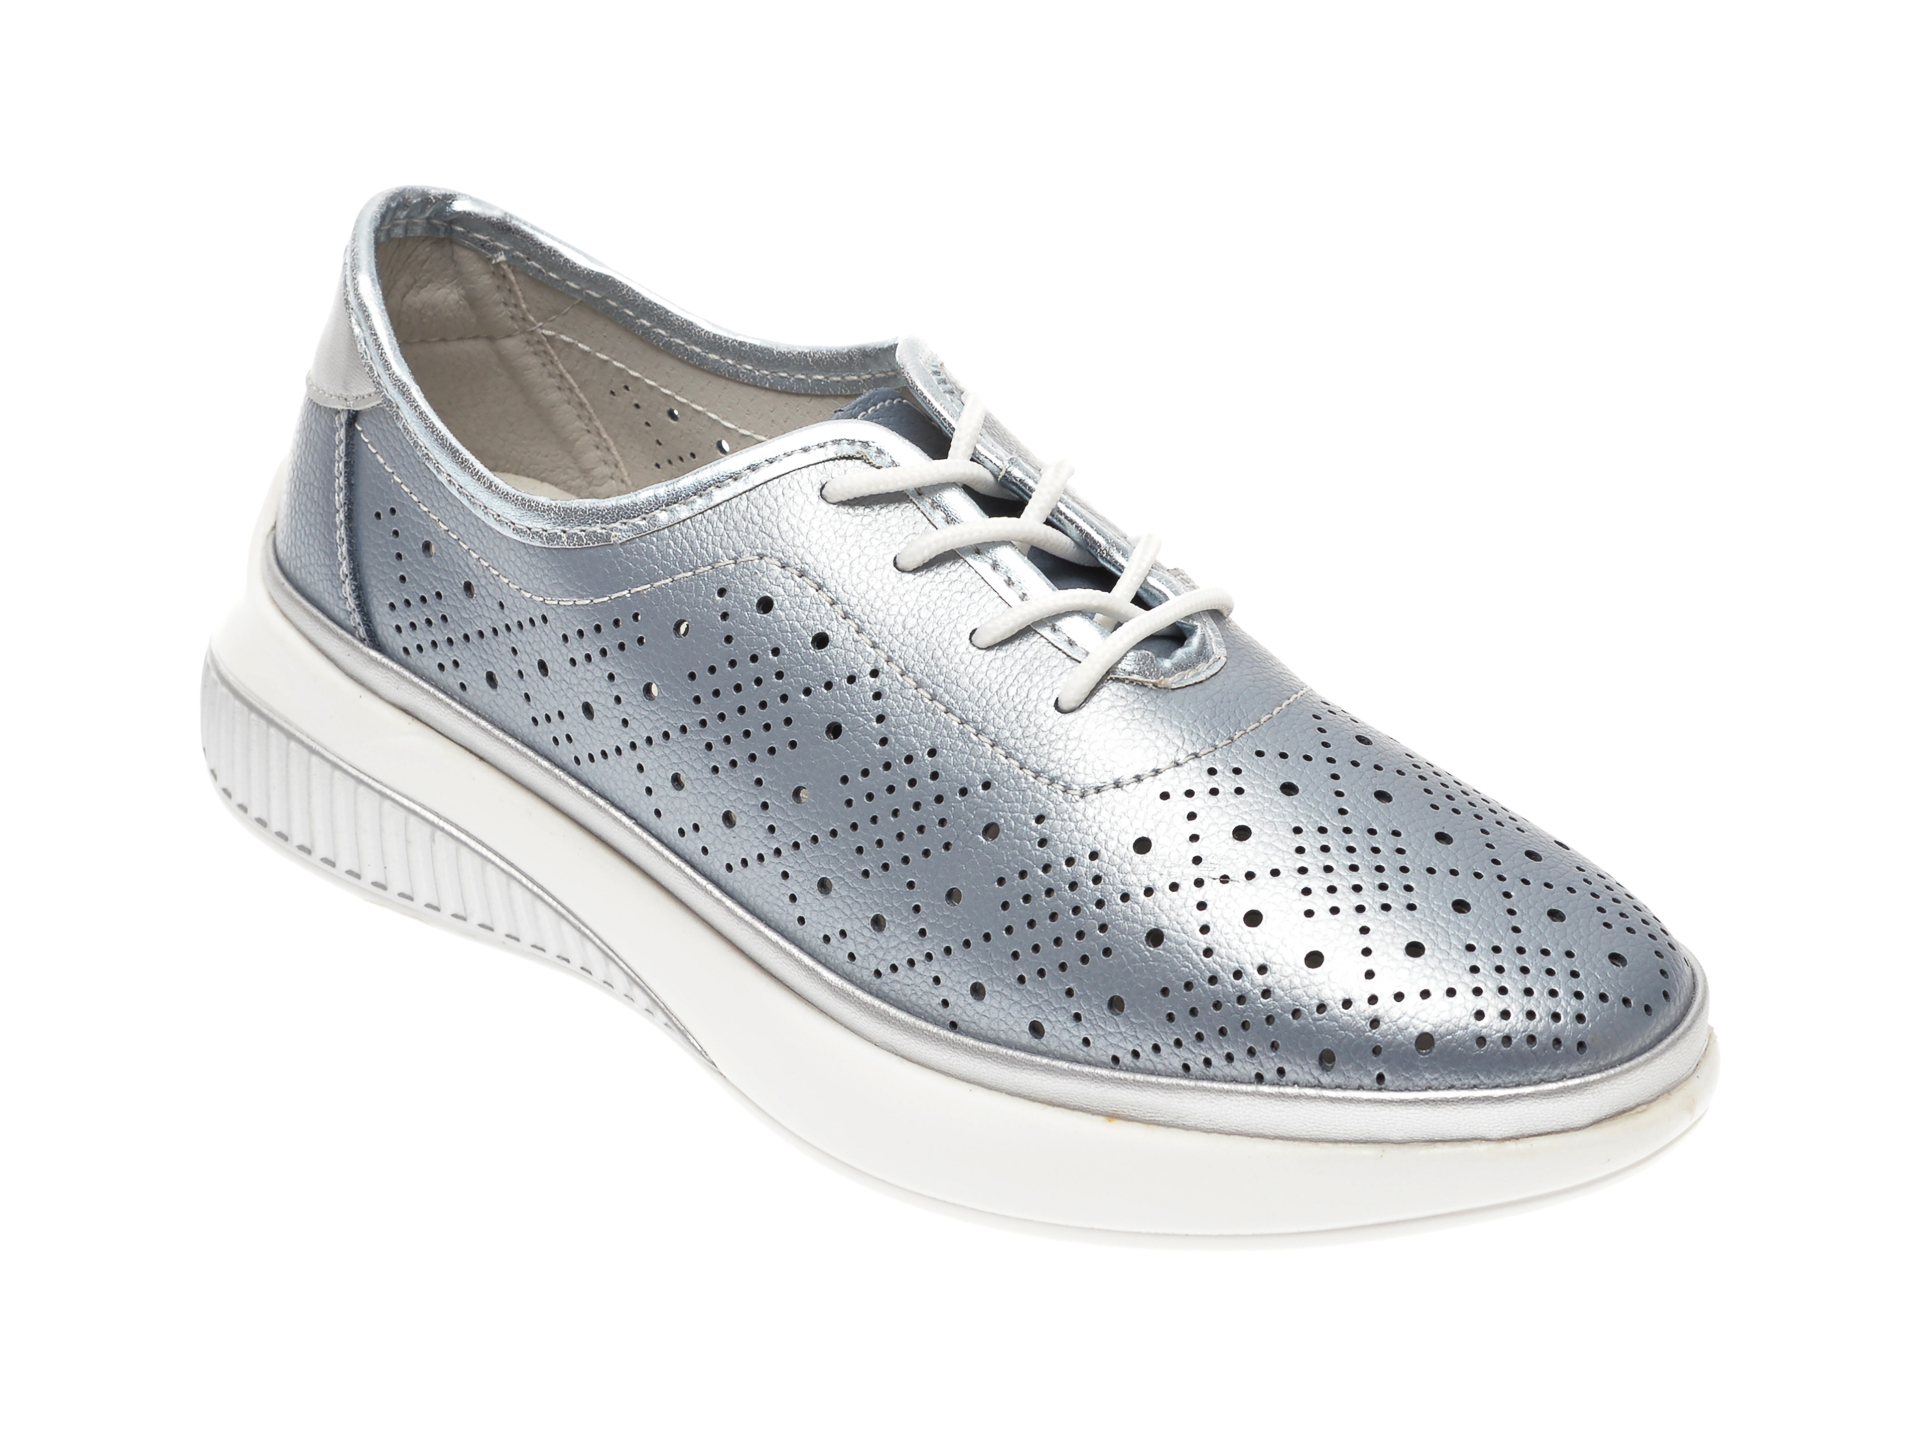 Pantofi IMAGE albastri, 807, din piele naturala